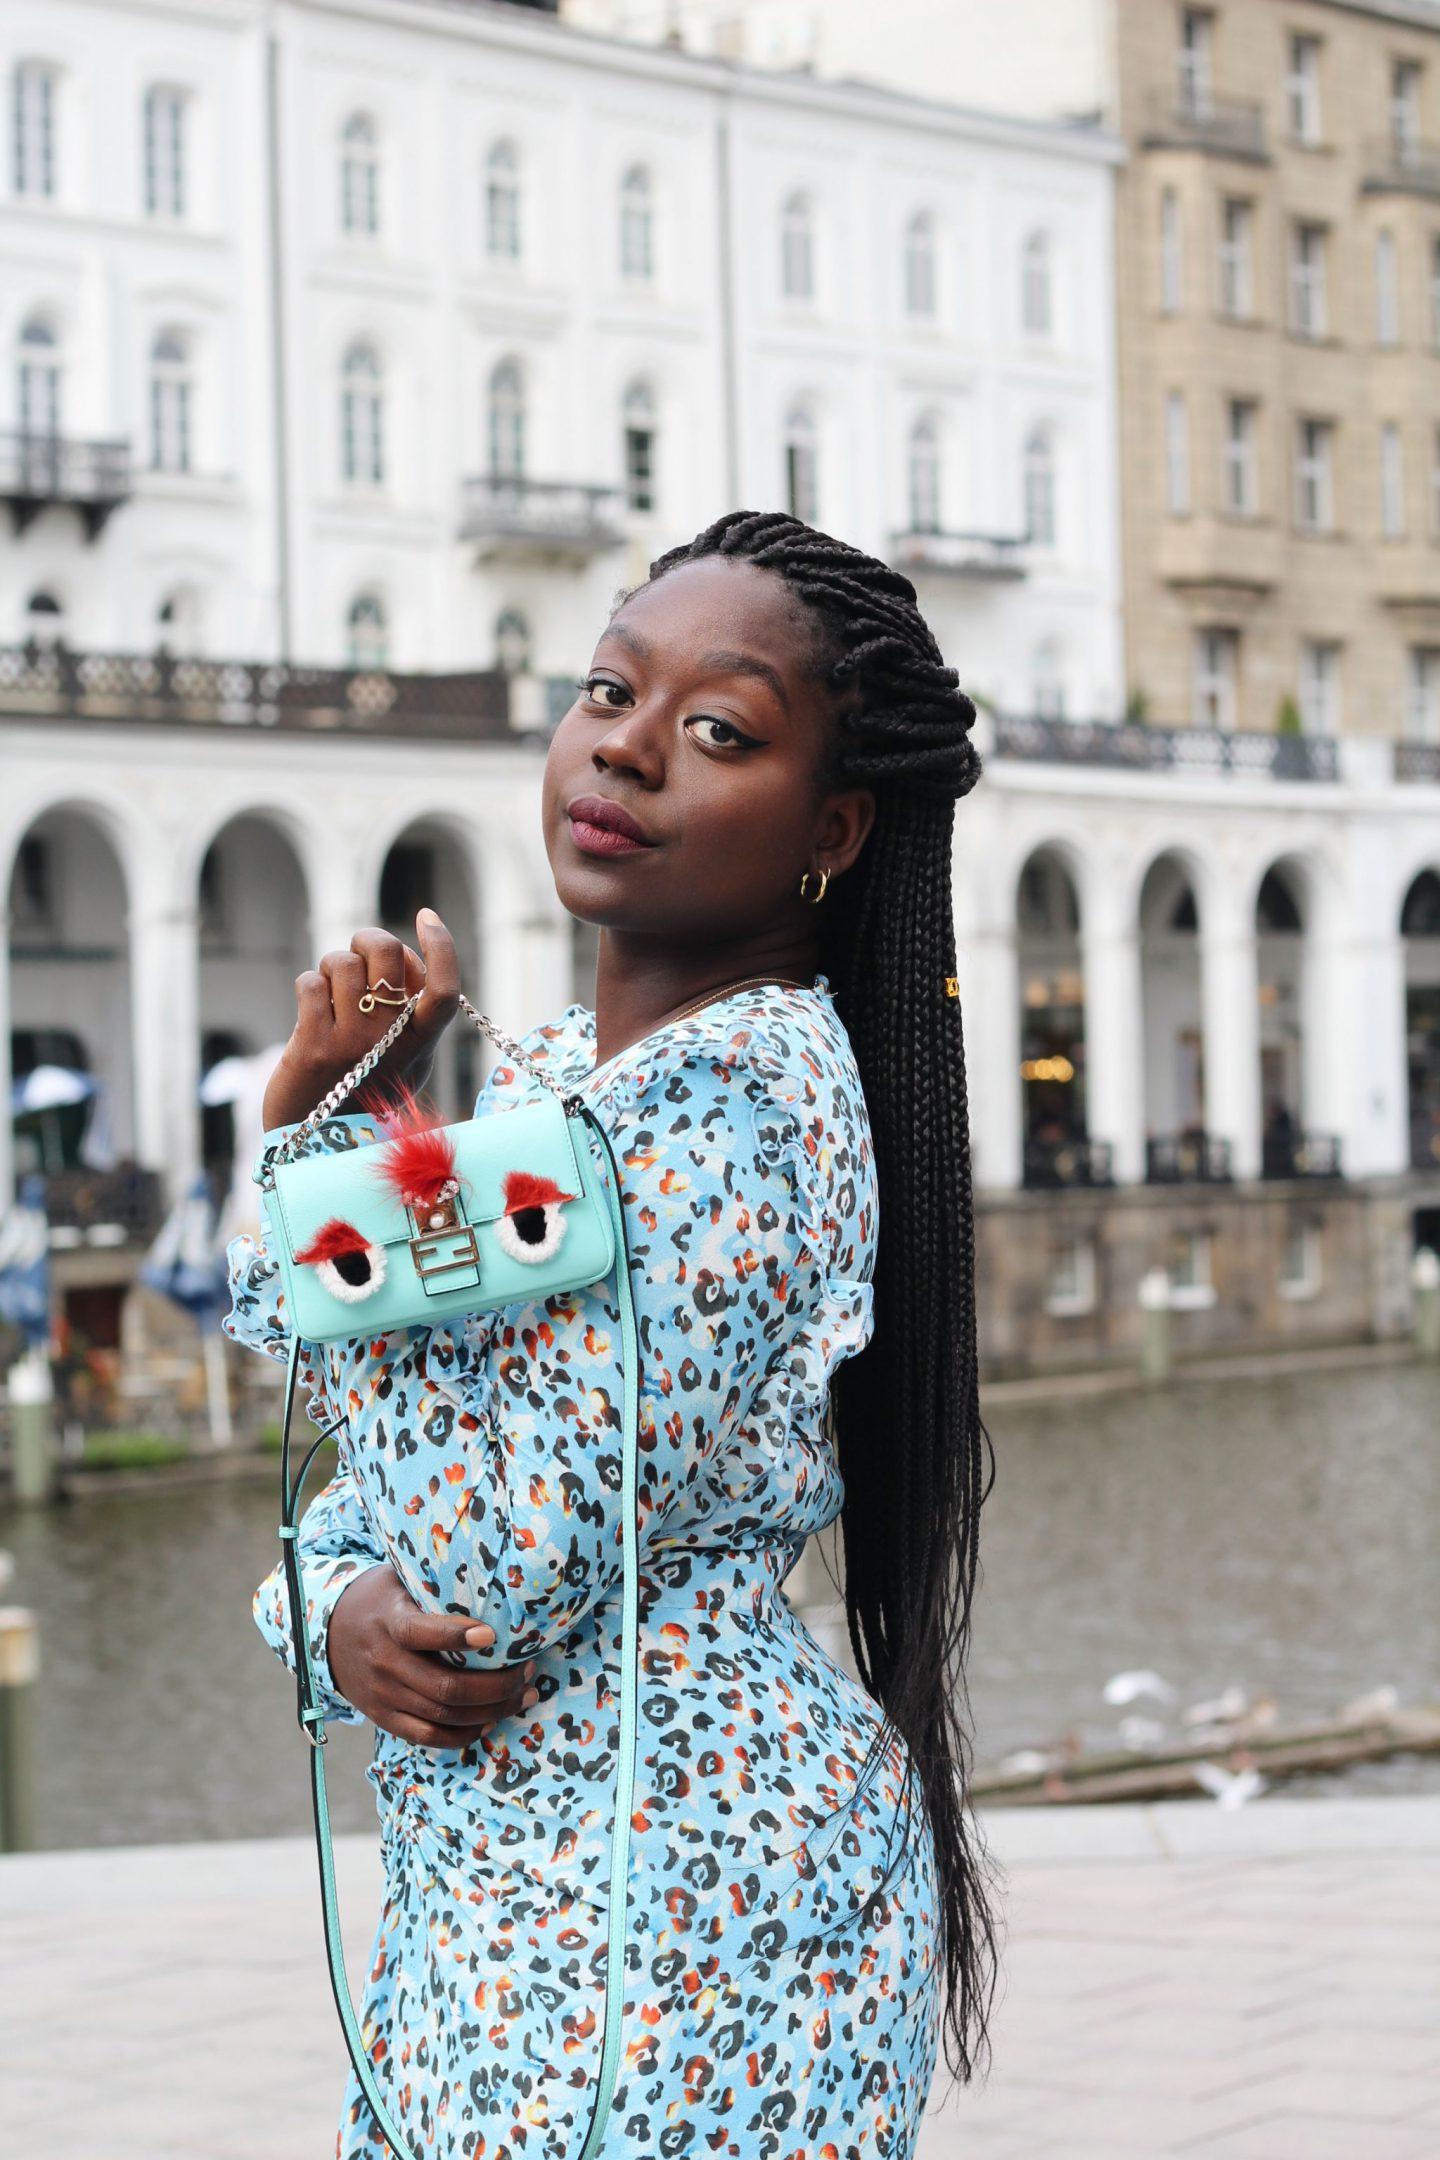 Lala_Berlin_Streetstyle_Lois_Opoku_Fashion_Blogger_Fendi_Monster_lisforlois_3